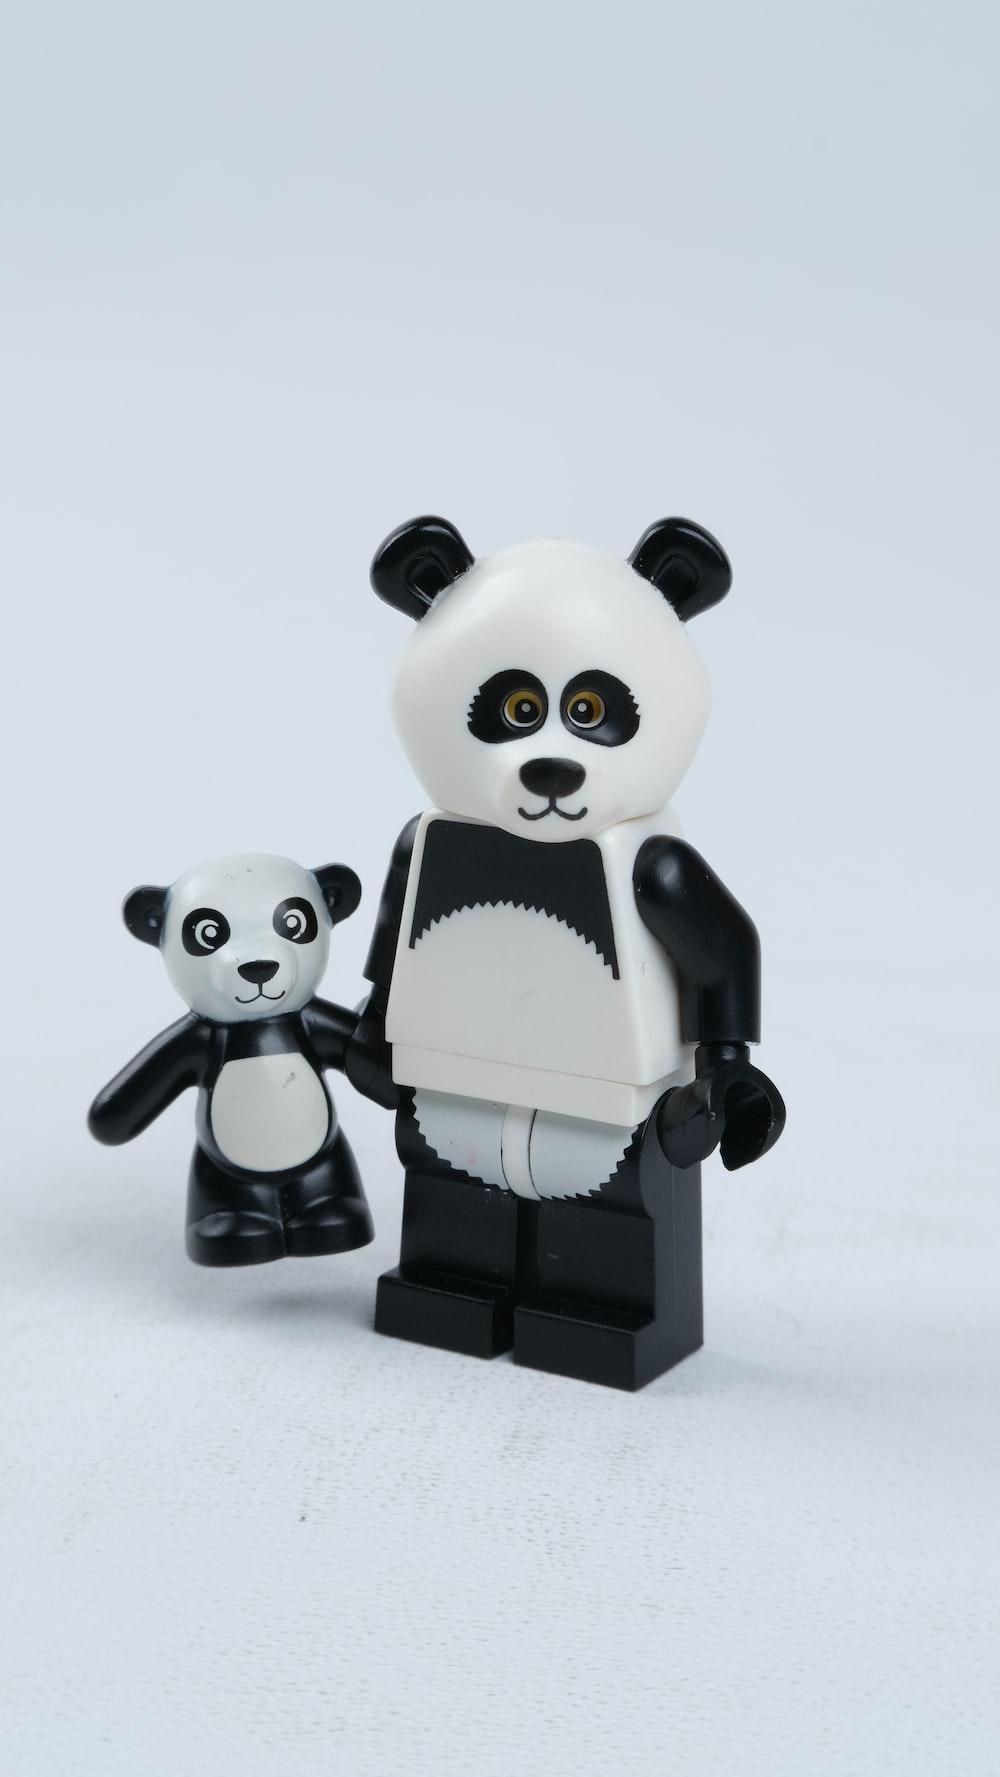 white and black panda figurine